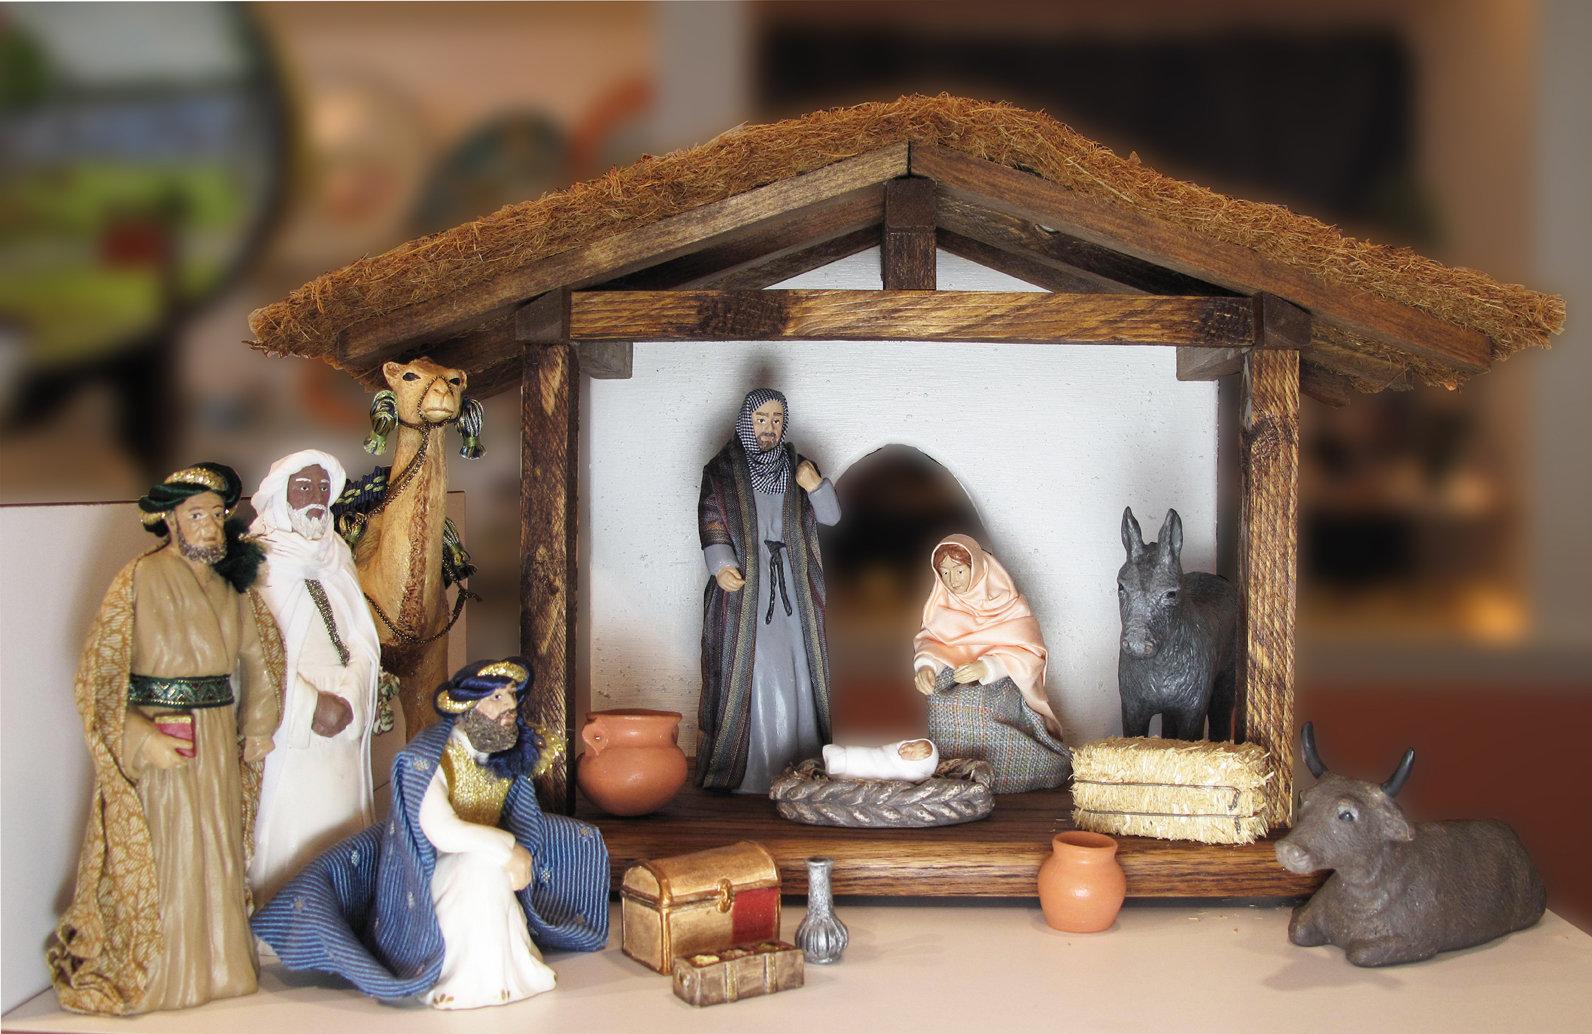 12 Piece Deluxe Nativity Set NT-FIGS-12DELUXESETXX